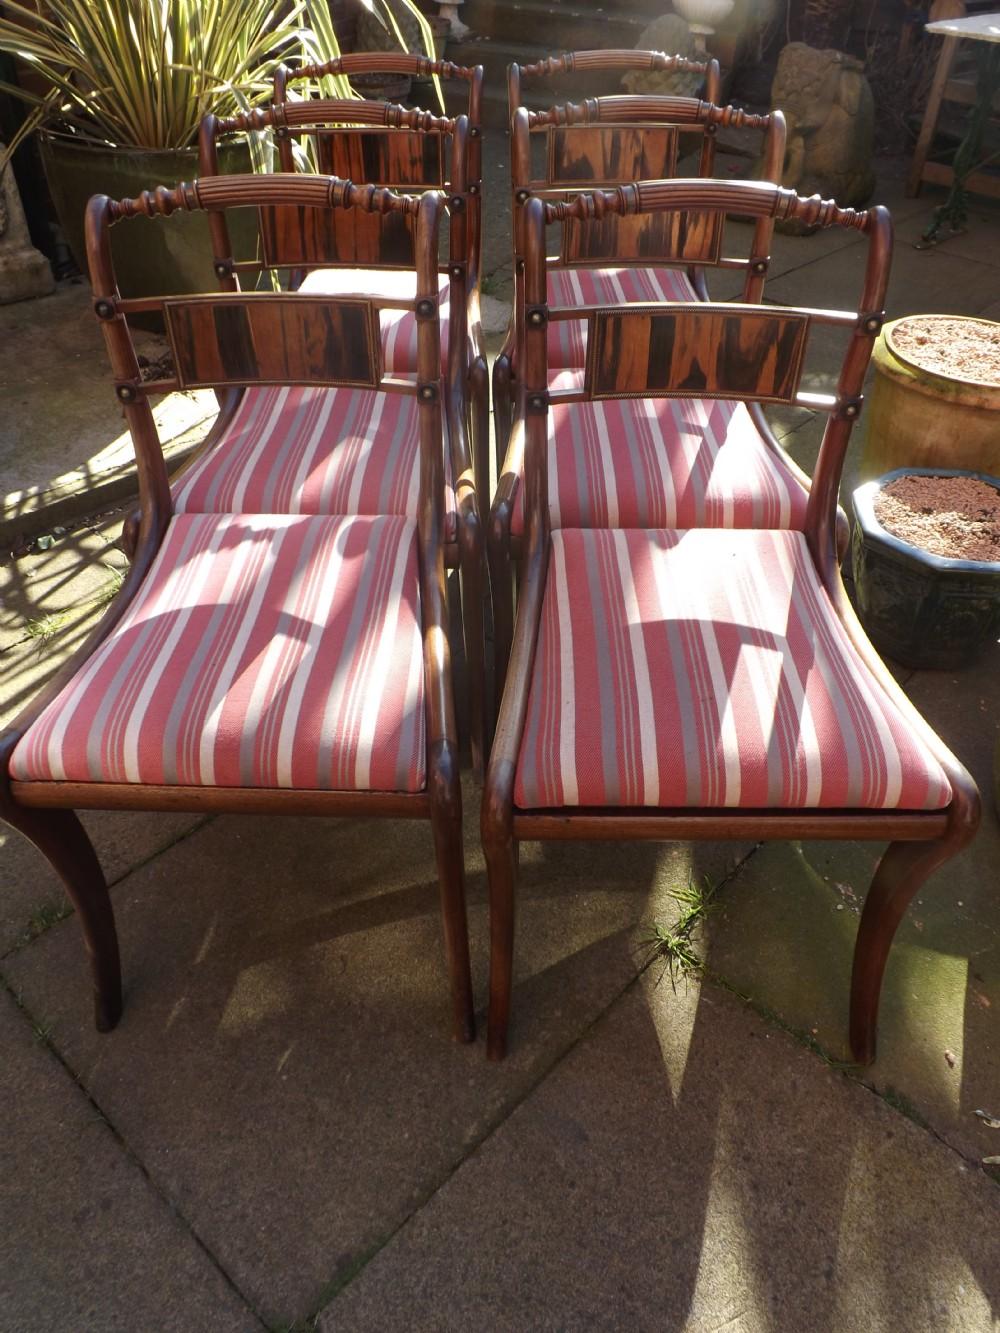 set of 6 early c19th regency period mahogany and coromandel wood sabreleg dining chairs